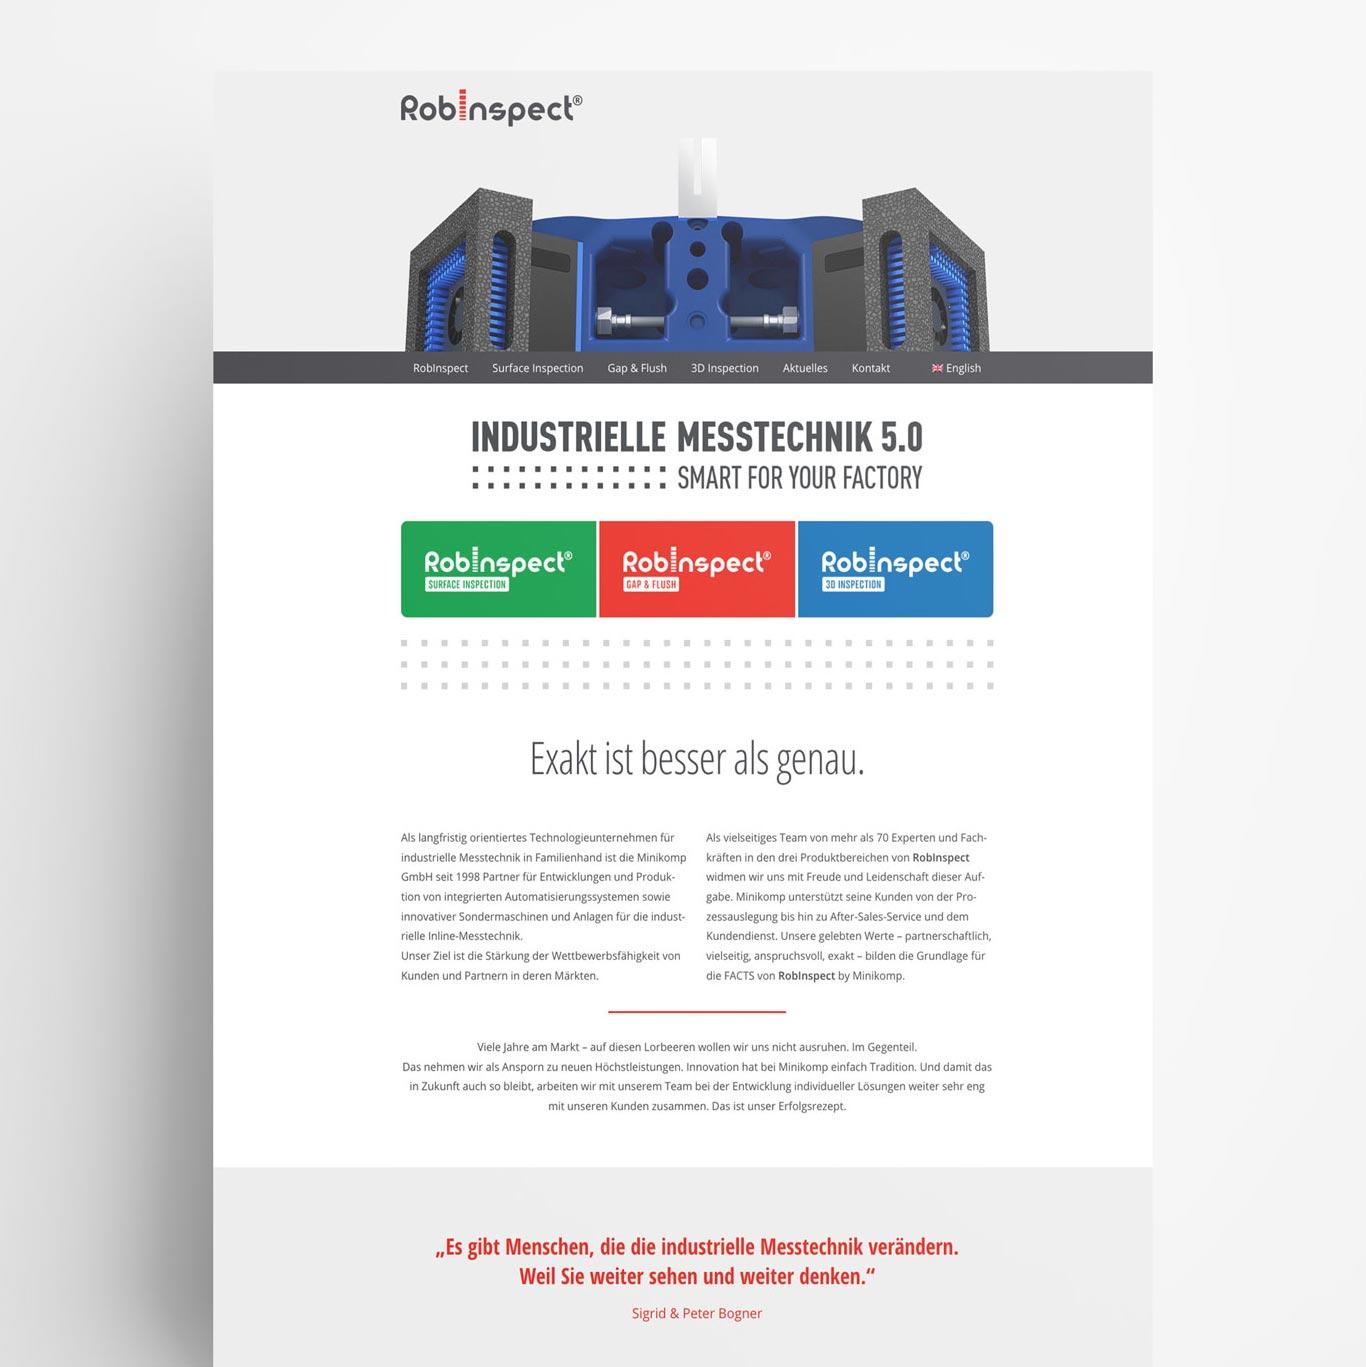 renoarde minikomp robinspect 001